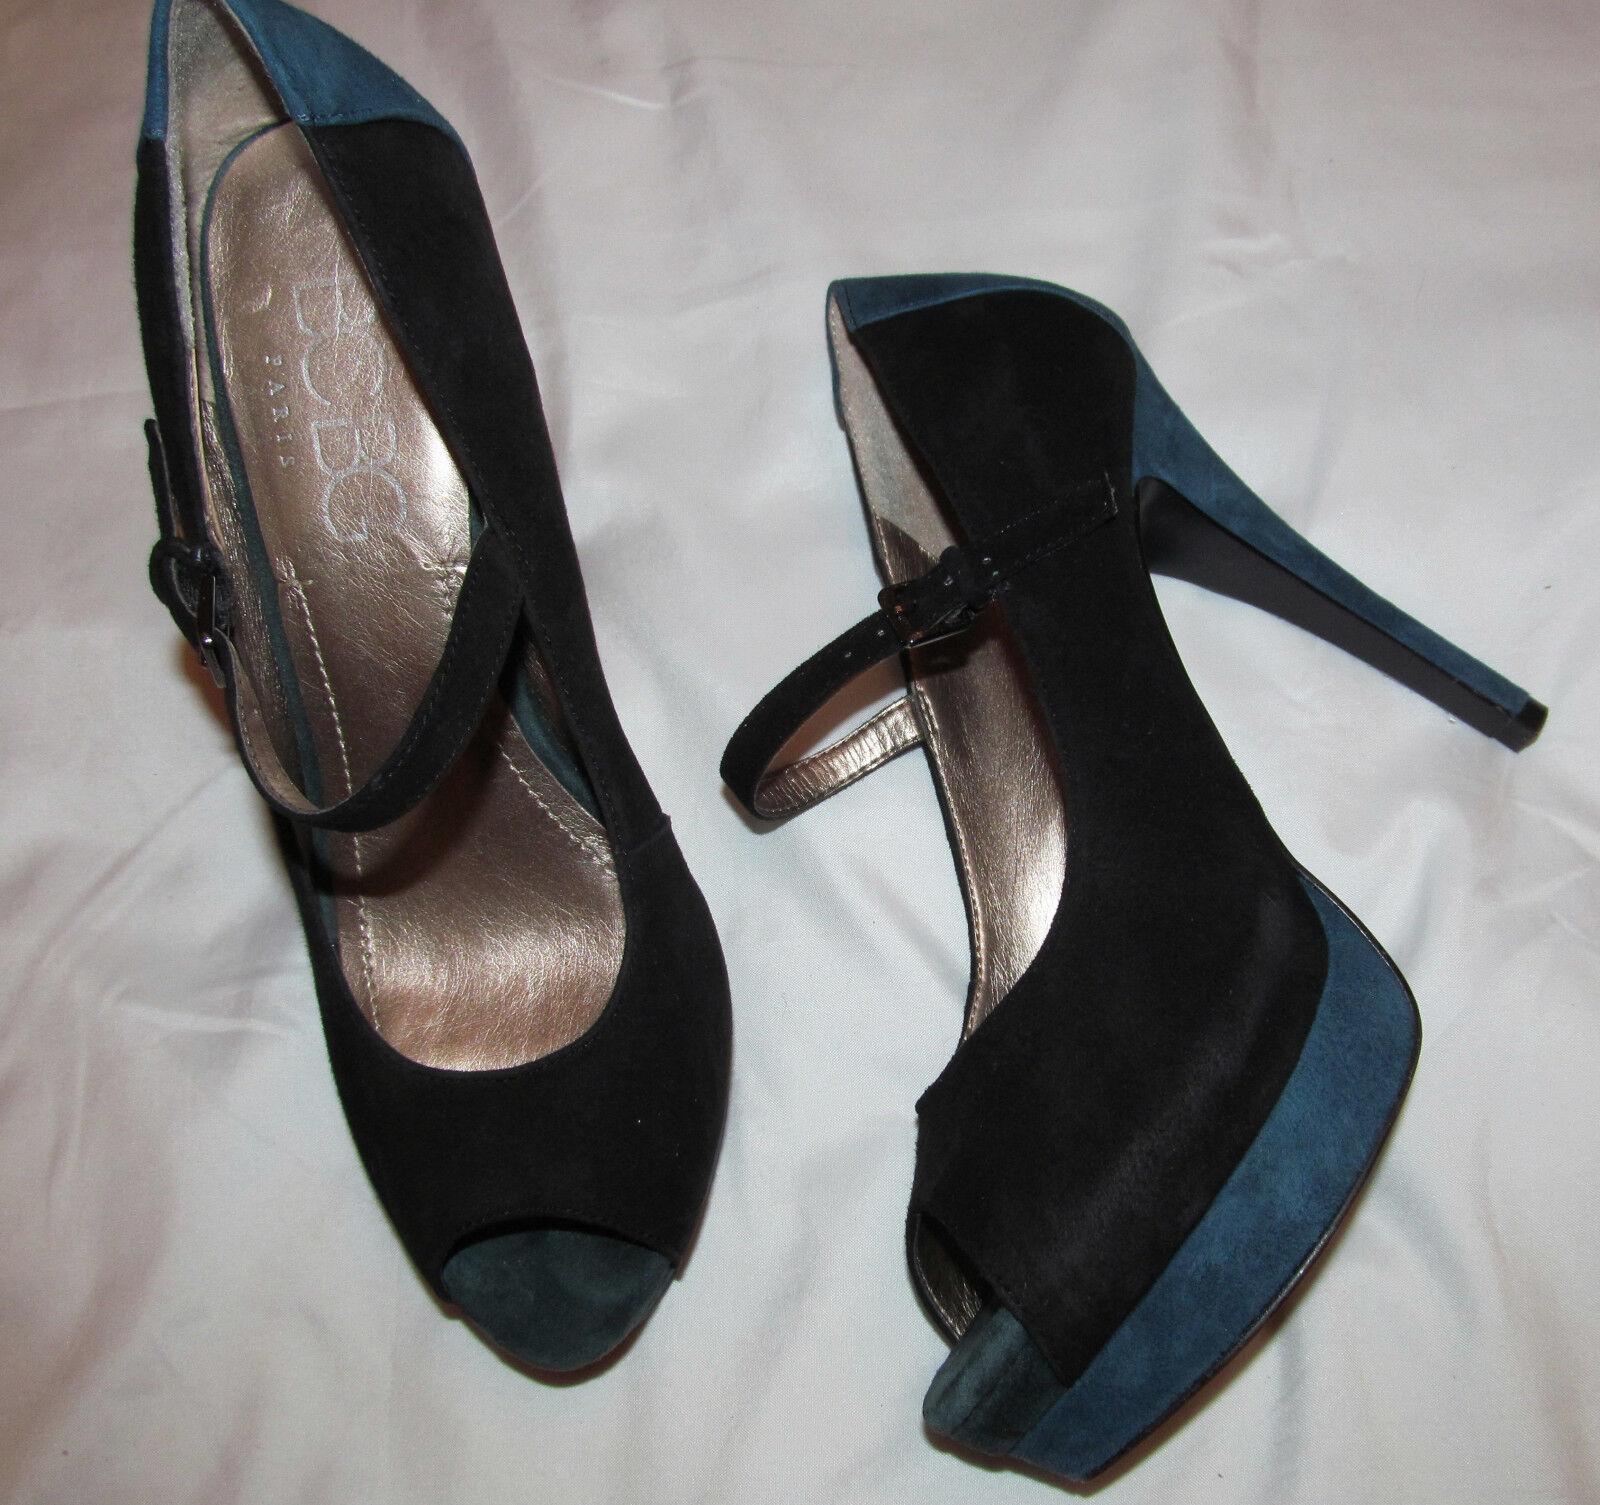 Bcbg Paris frannkie Gamuza Negro Y Azul Marino Marino Marino Mary Jane De Tacón Alto Peep Toe De Zapatos 15e0a2